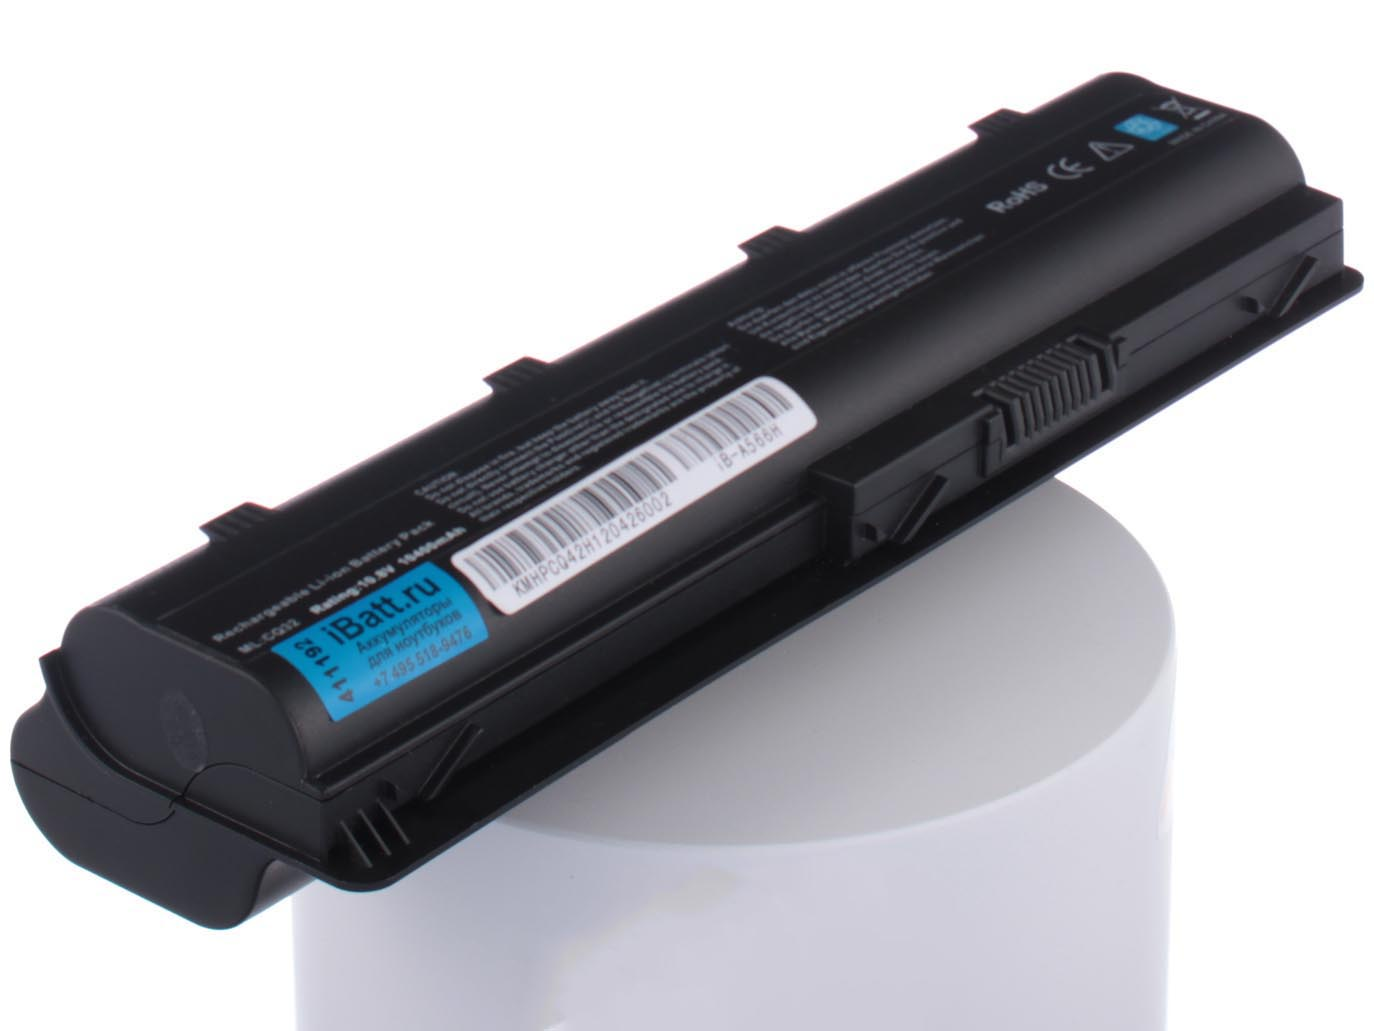 Аккумулятор для ноутбука iBatt для HP-Compaq G62-b12ER, Pavilion g7-1102er, Pavilion g7-1352er, Pavilion dv6-3105er, Pavilion dv6-6029er, Pavilion dv6-6b02er, Pavilion g6-2051er, Pavilion dv7-4100er, Pavilion dv7-6052er